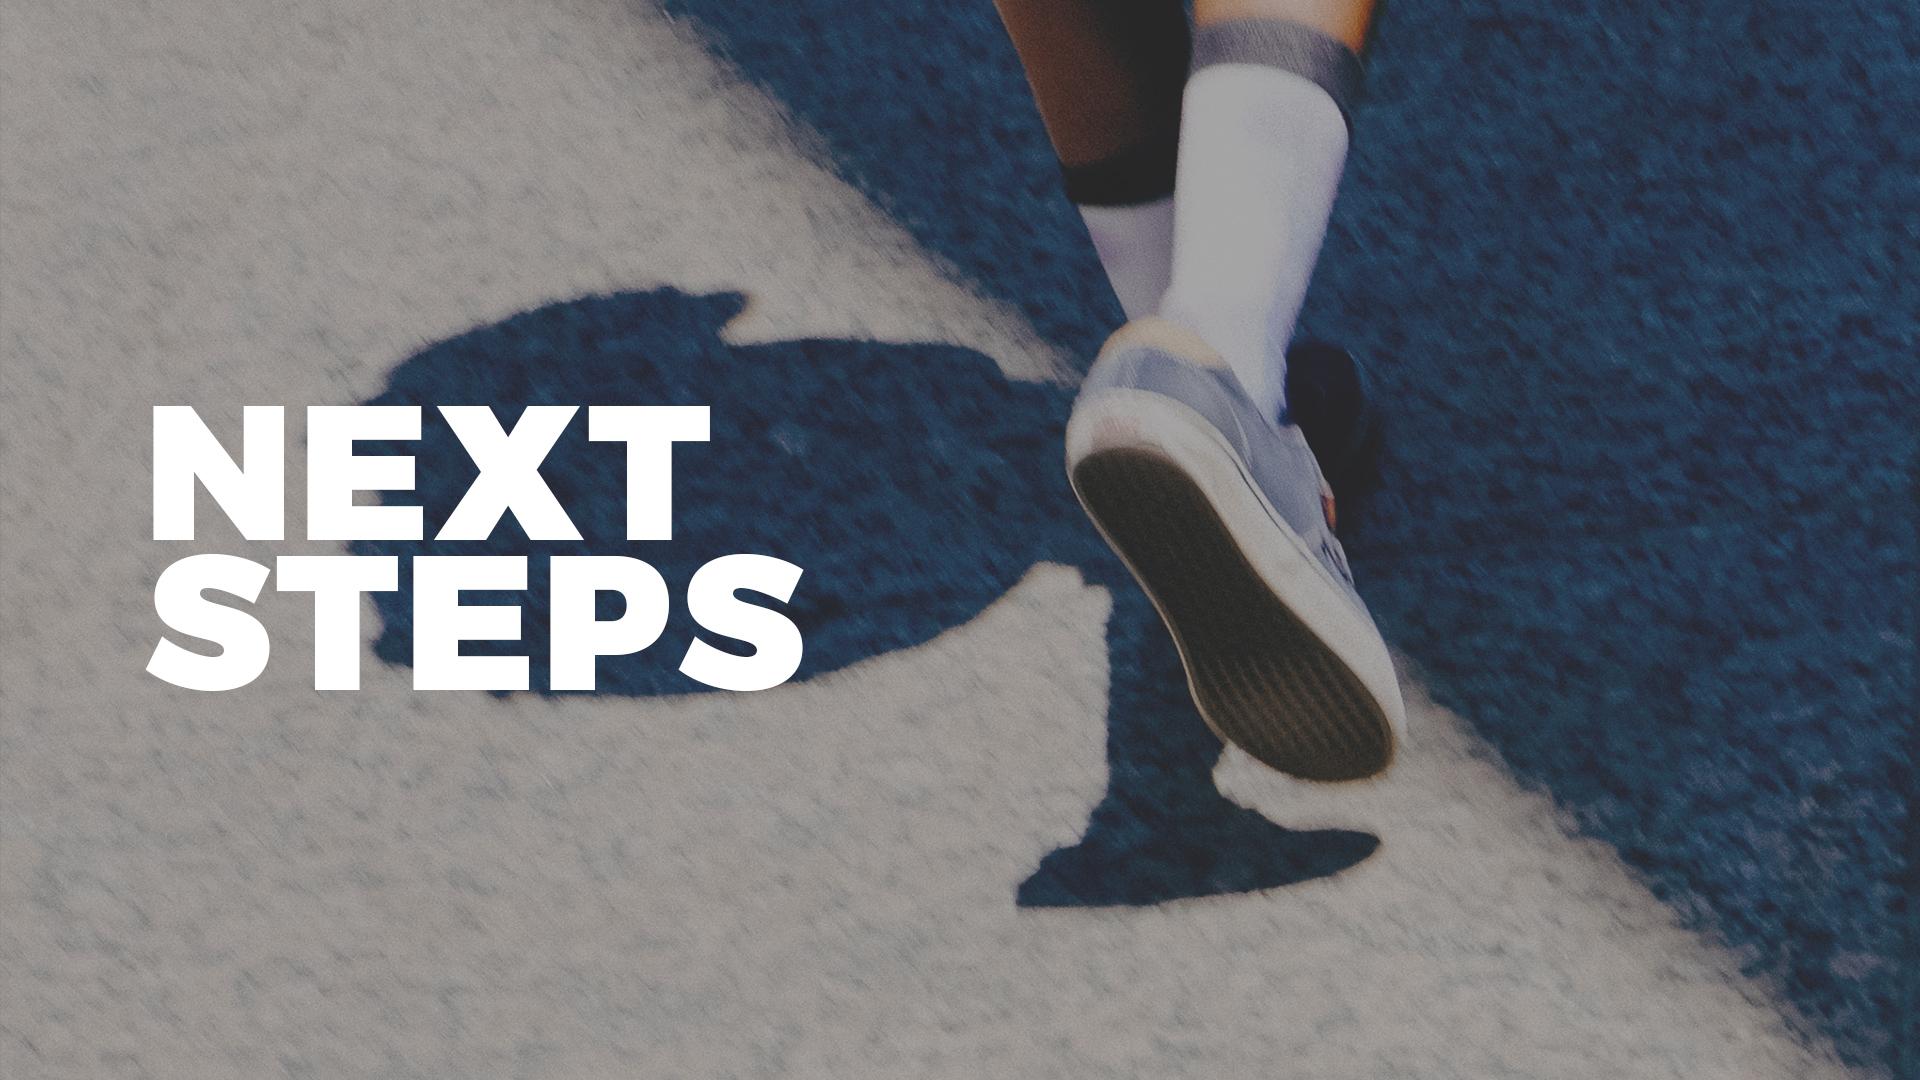 next steps graphic.jpg